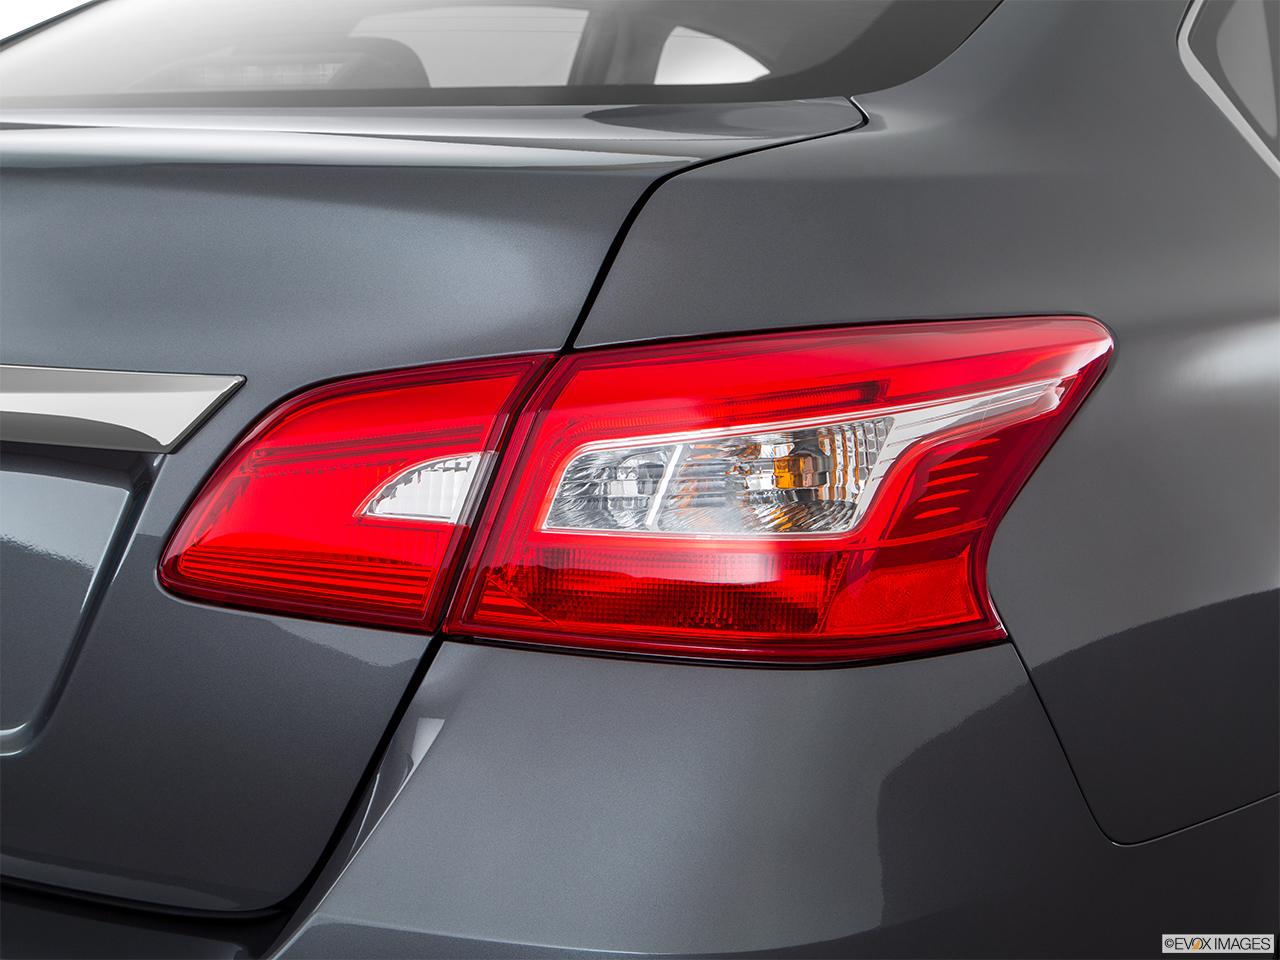 Nissan Sentra 2018 Uae >> Nissan Sentra 2018 1.8L S in Qatar: New Car Prices, Specs, Reviews & Photos | YallaMotor